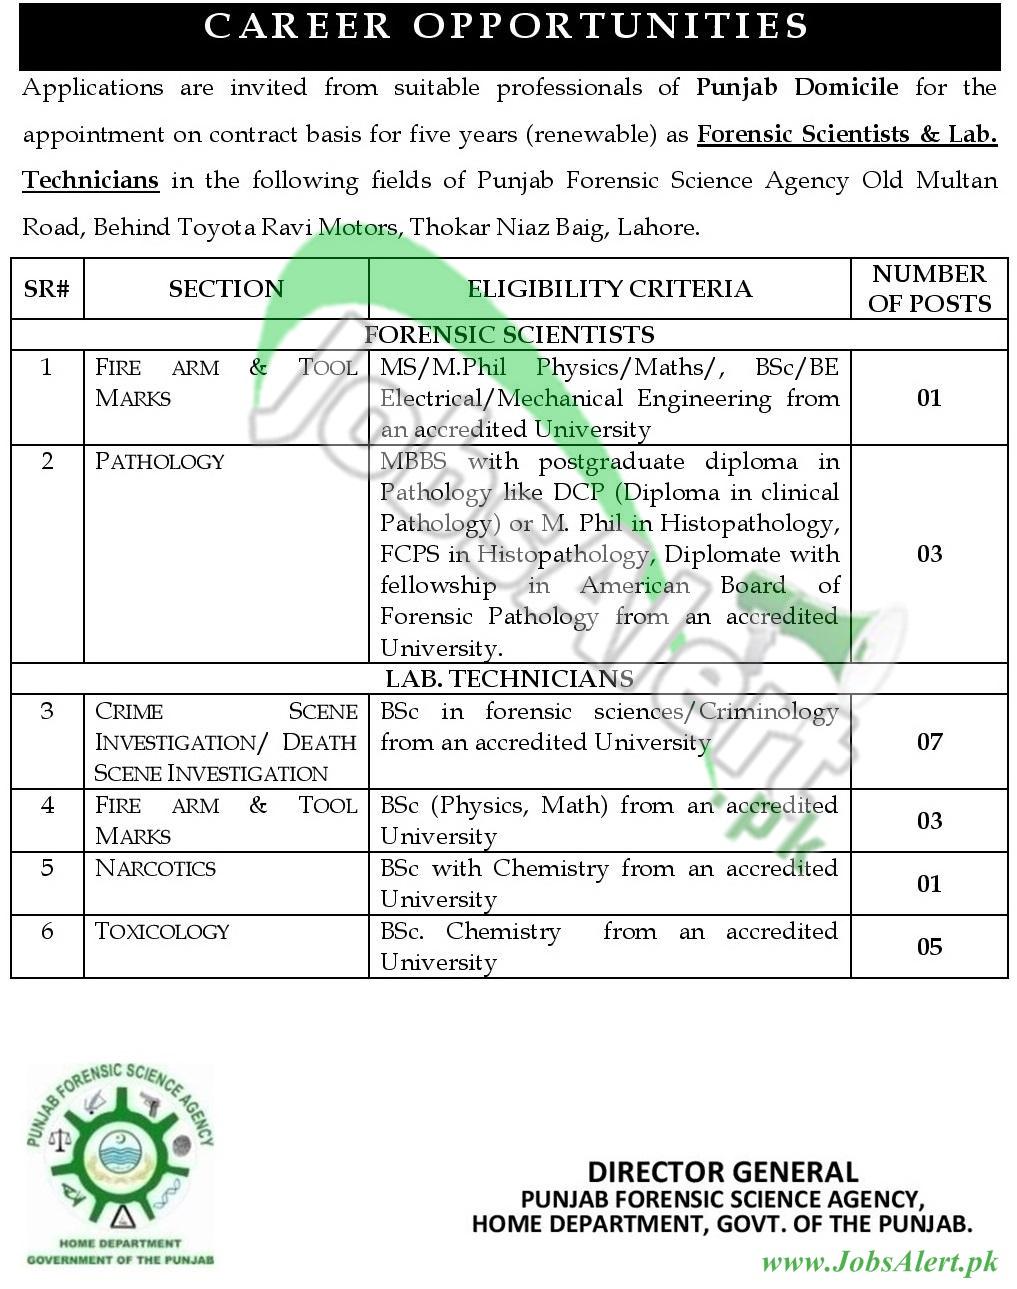 Punjab Forensic Science Agency